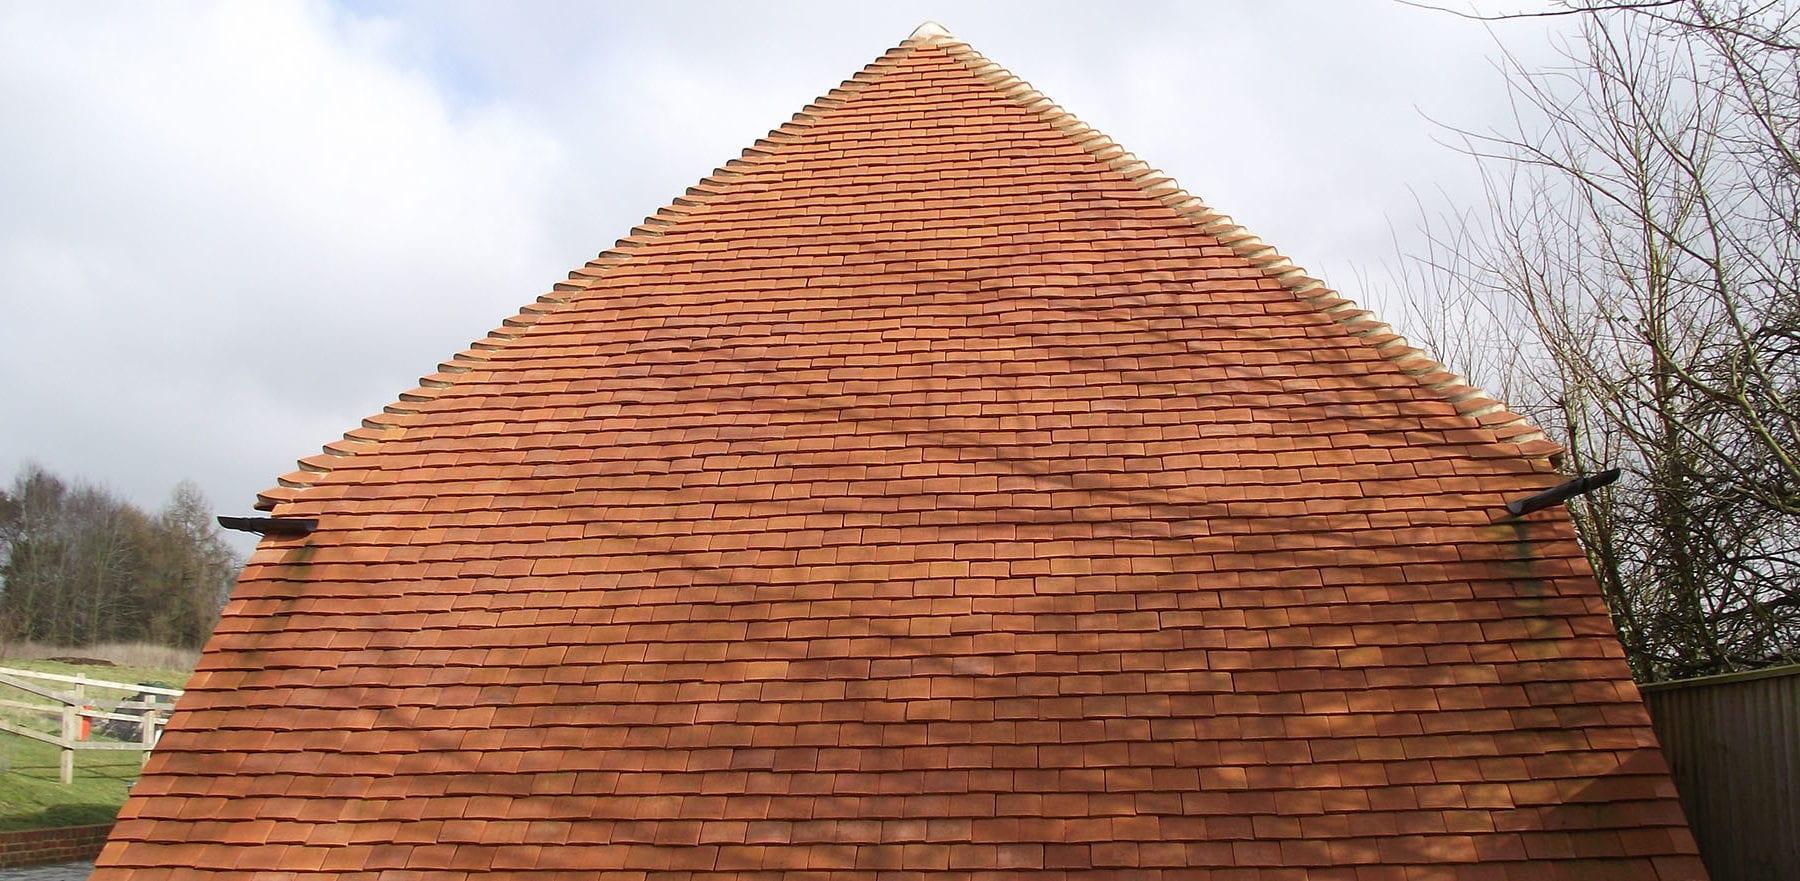 Lifestiles - Handmade Orange Clay Roof Tiles - Baughurst, England 9